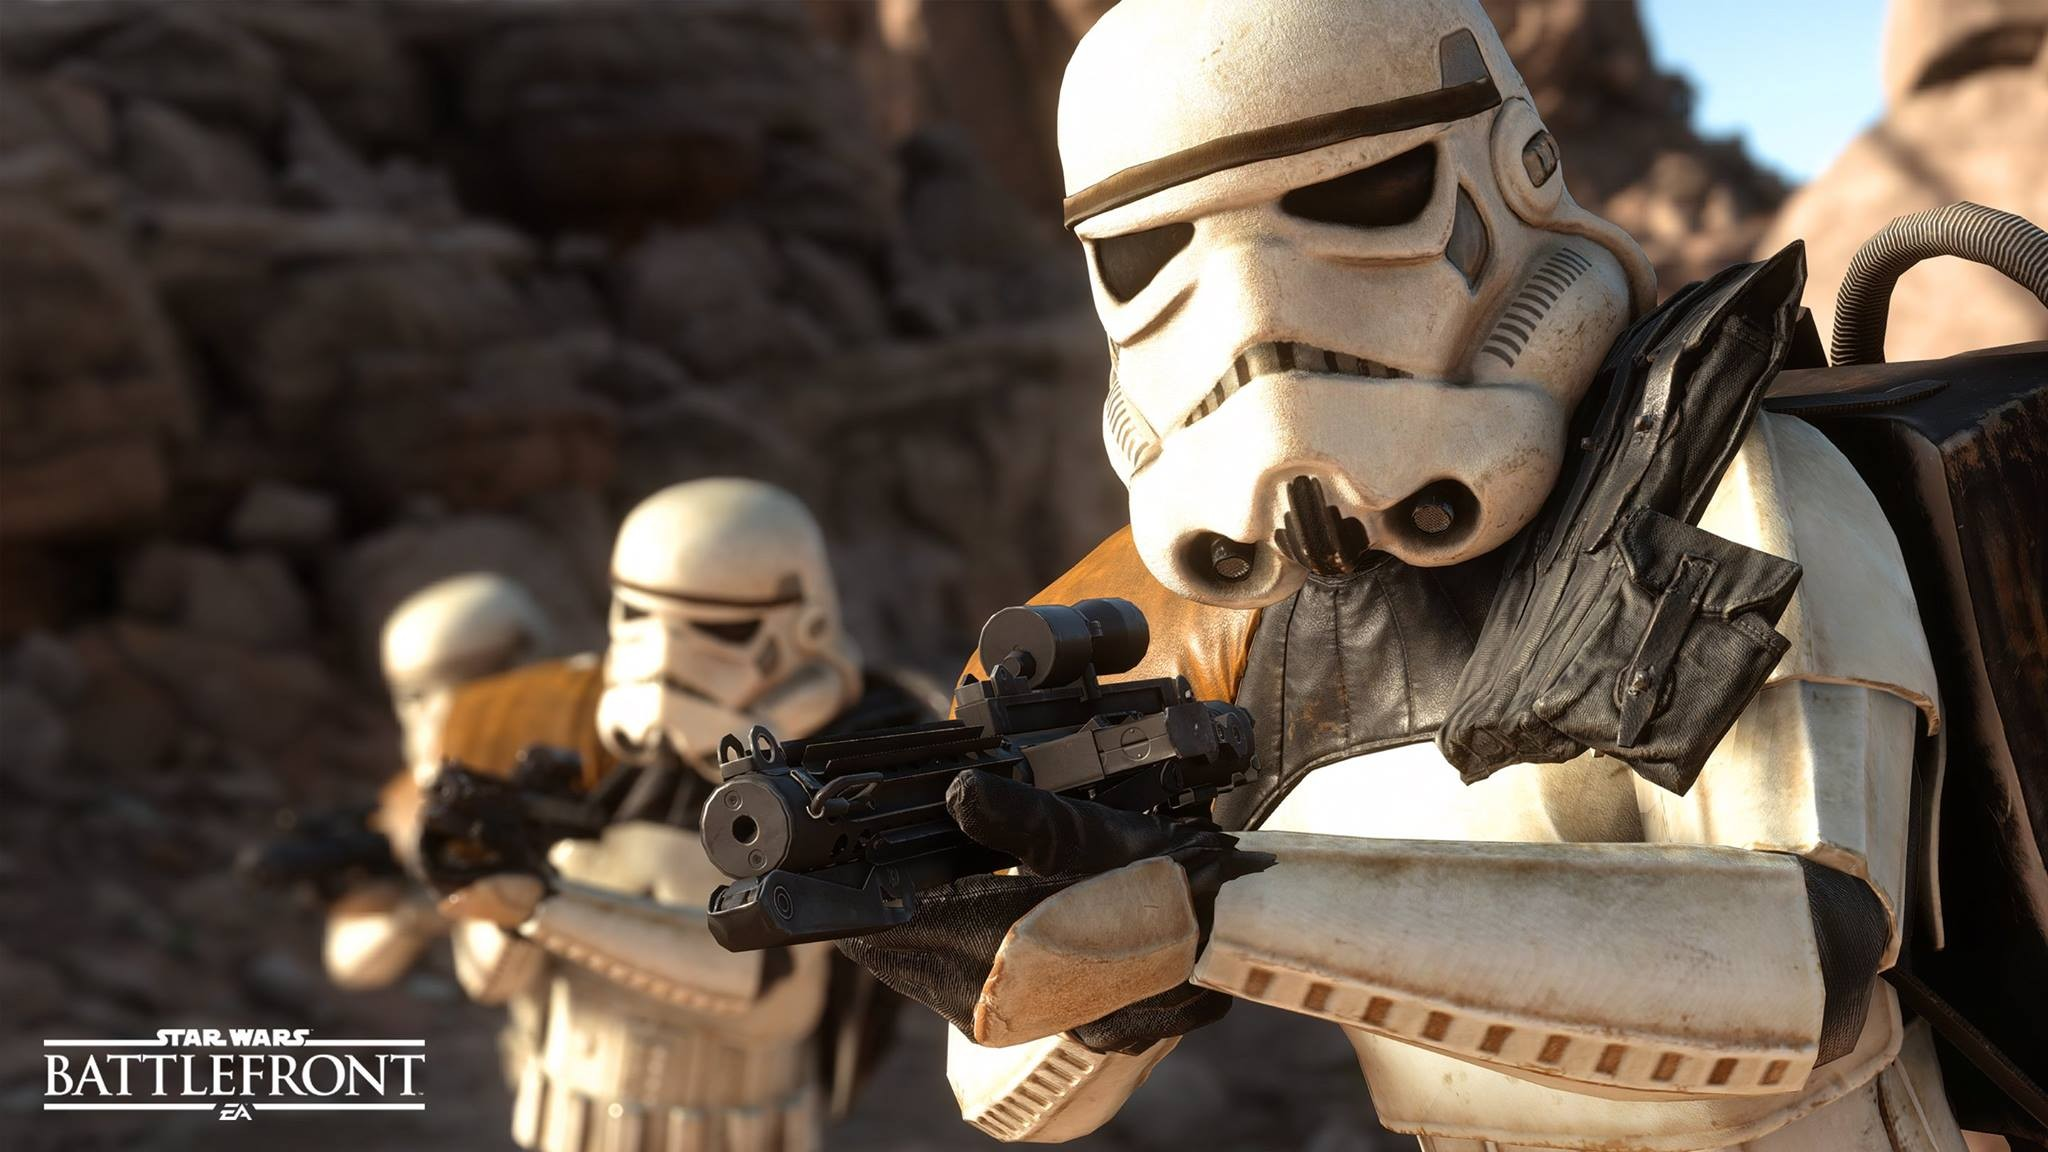 47-471105_stormtrooper-star-wars-battlefront.jpg